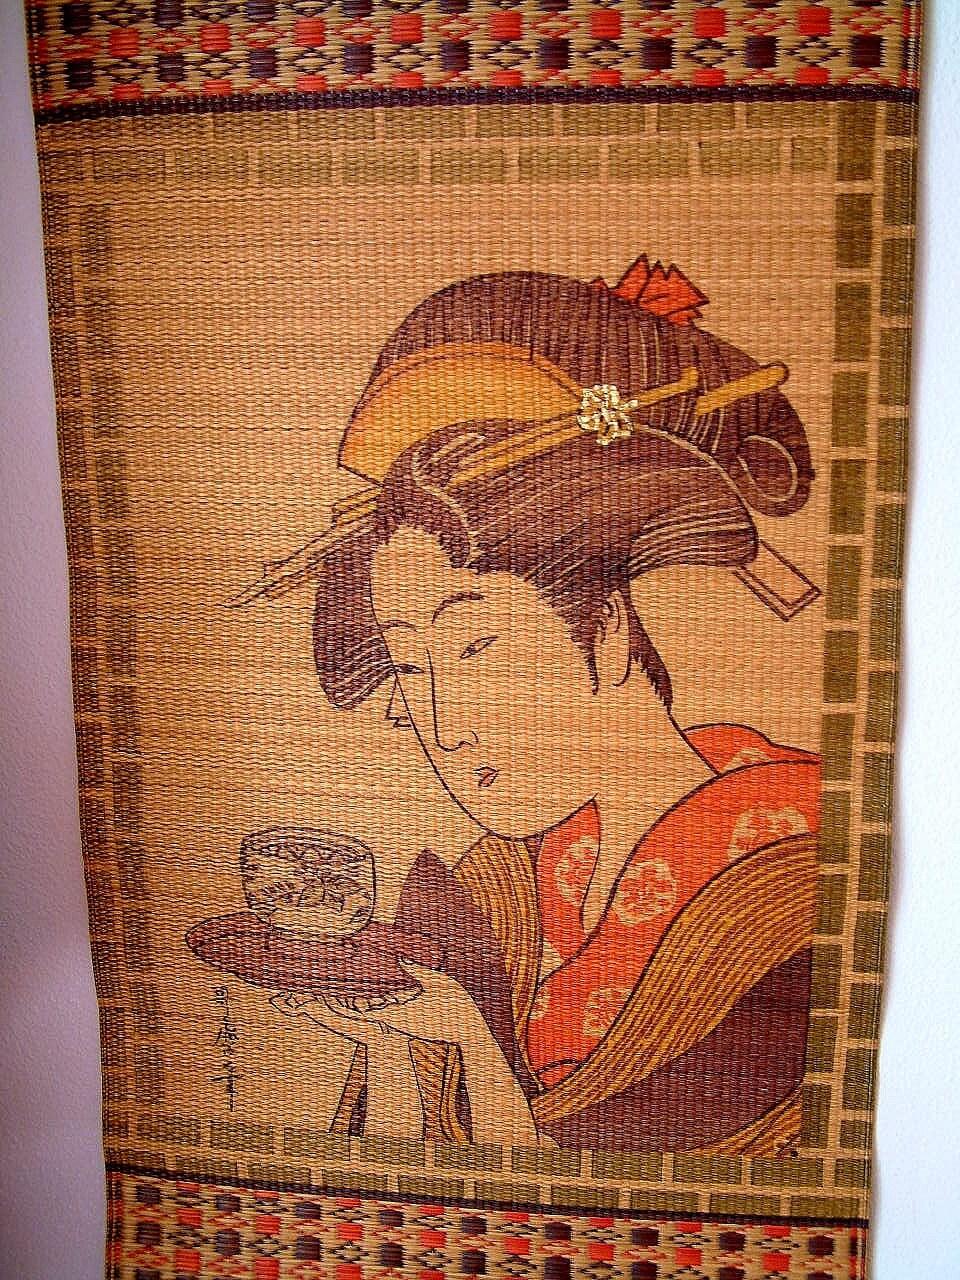 geisha japonaise servant le th grass mat d filer tenture. Black Bedroom Furniture Sets. Home Design Ideas